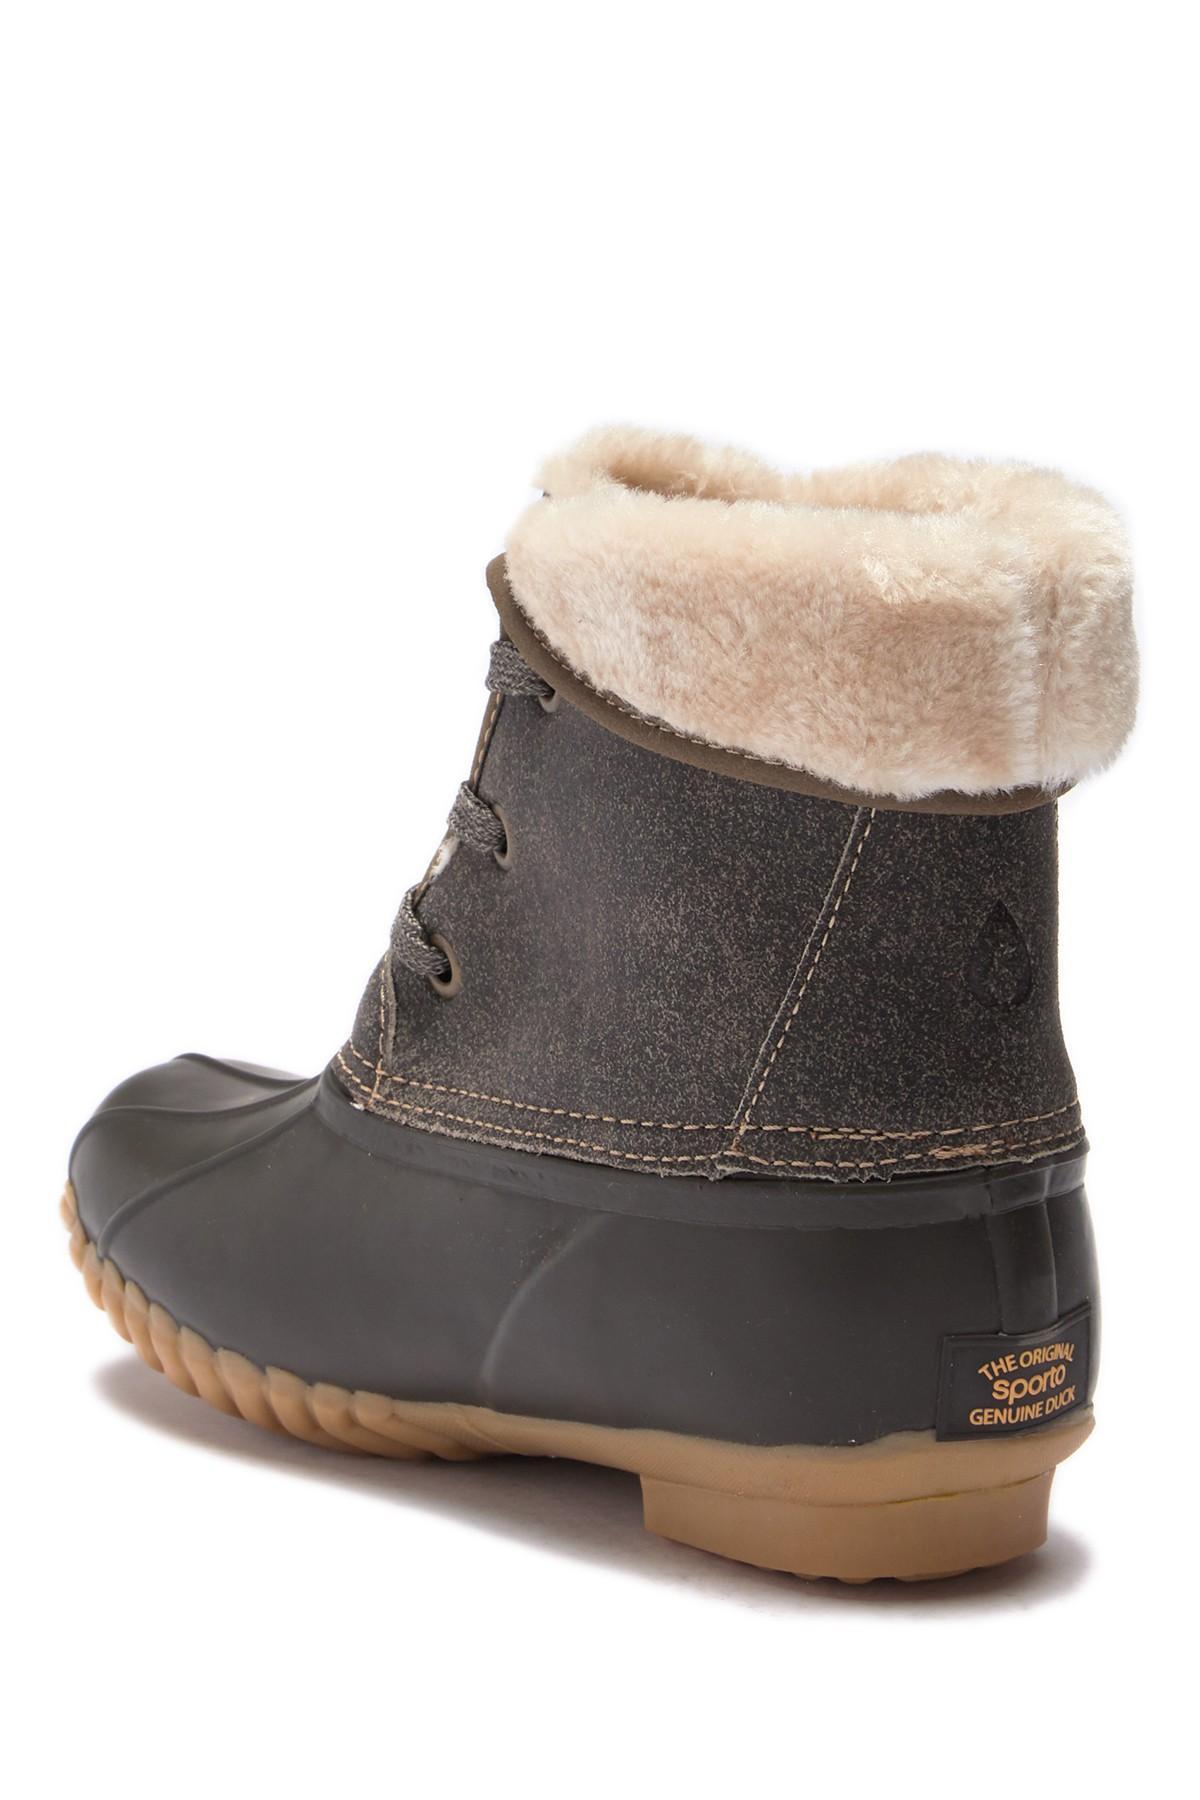 41b962a5012 Lyst - Sporto Degas 2 Faux Fur Duck Boot